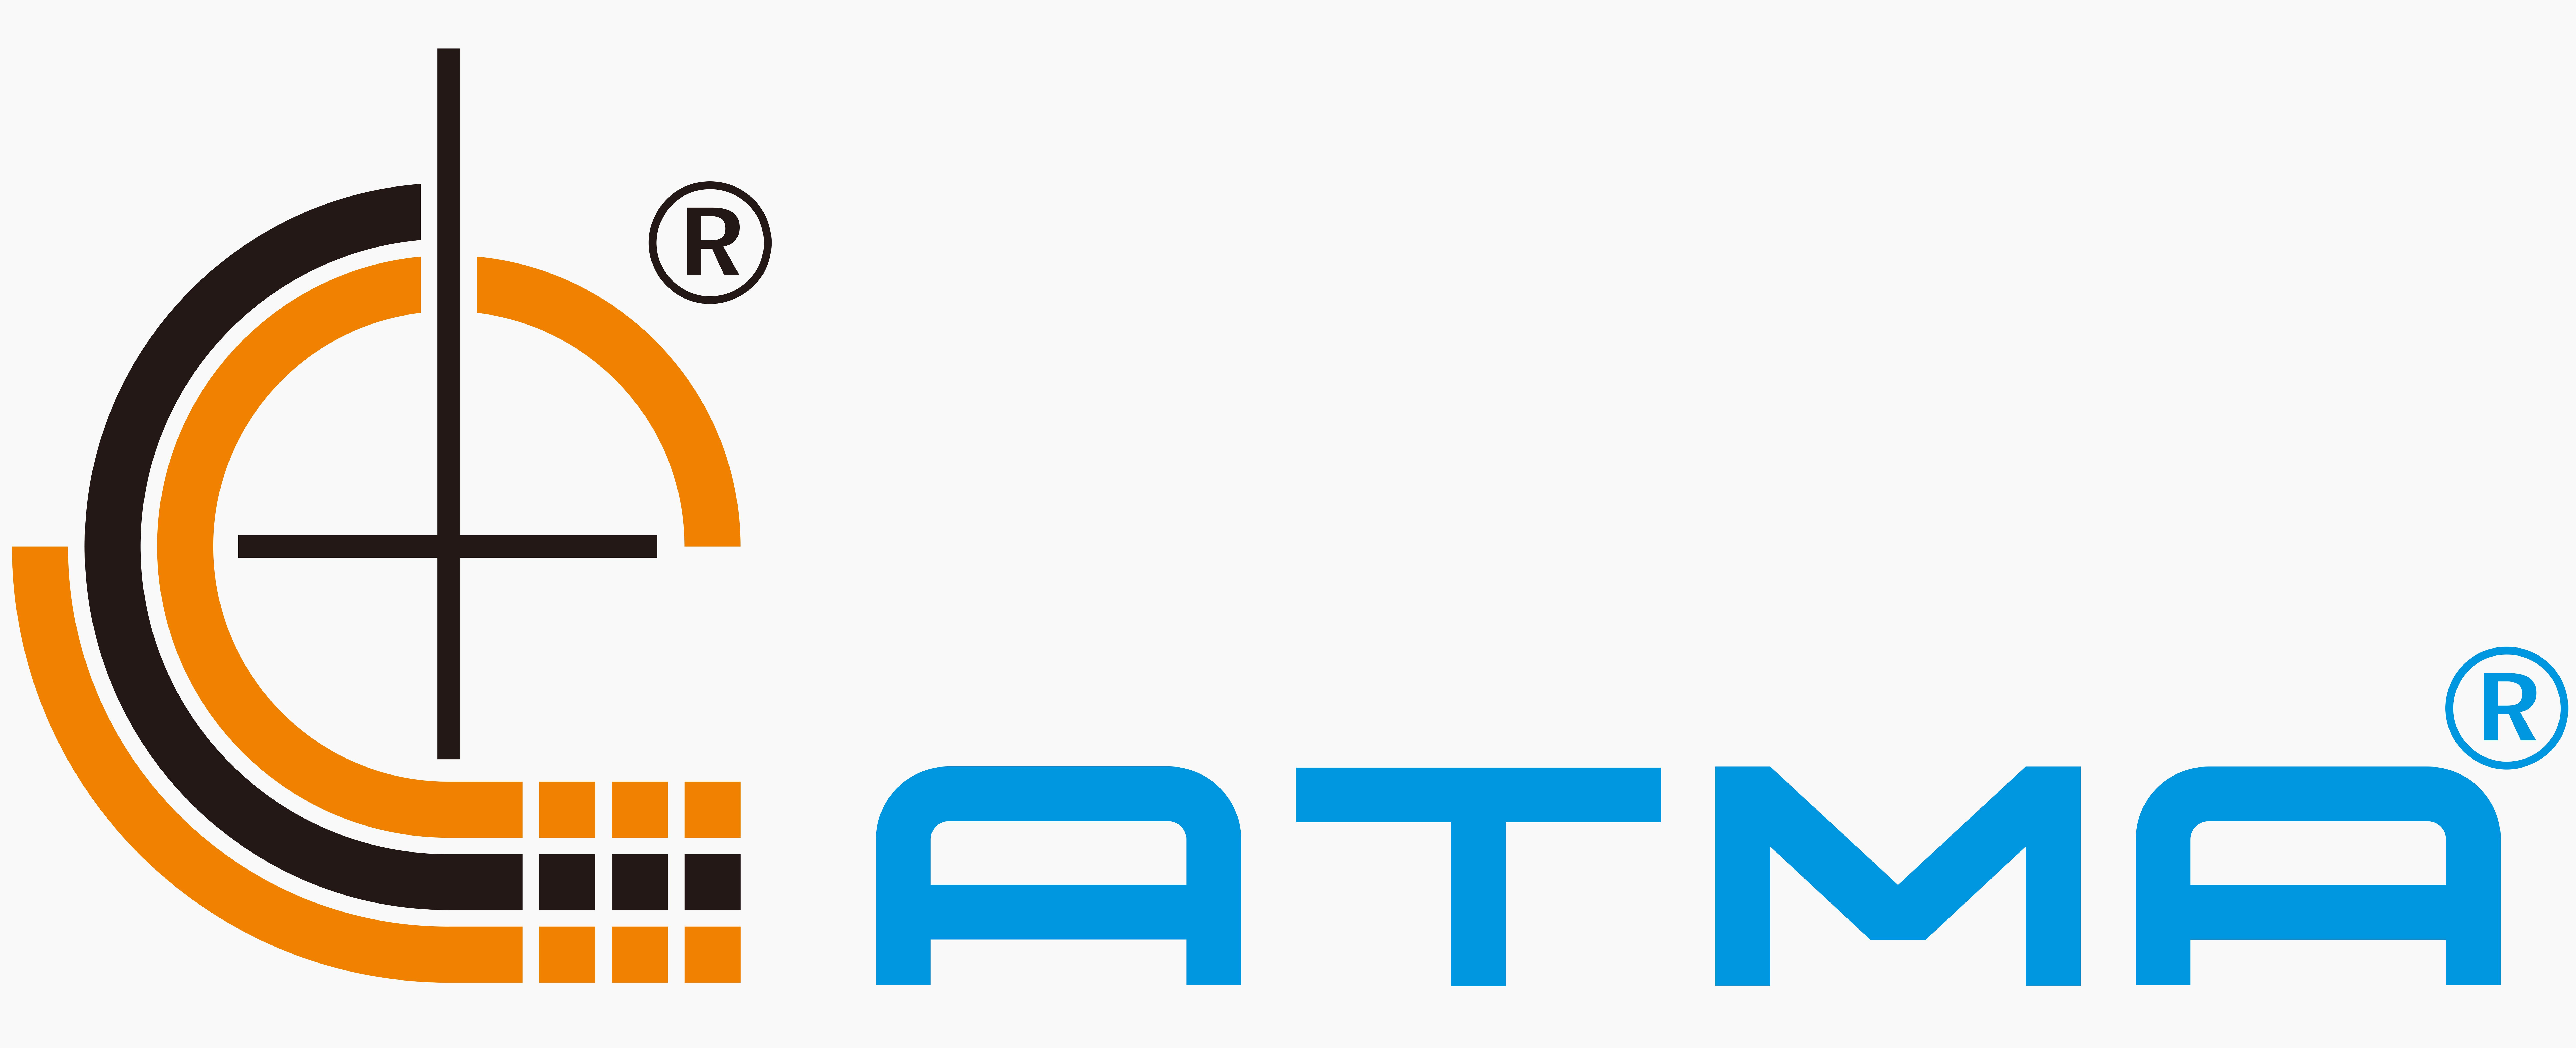 ATMA מייצג אוטומציה של מכונות טייוואן מתקדמות או טונג יואן.